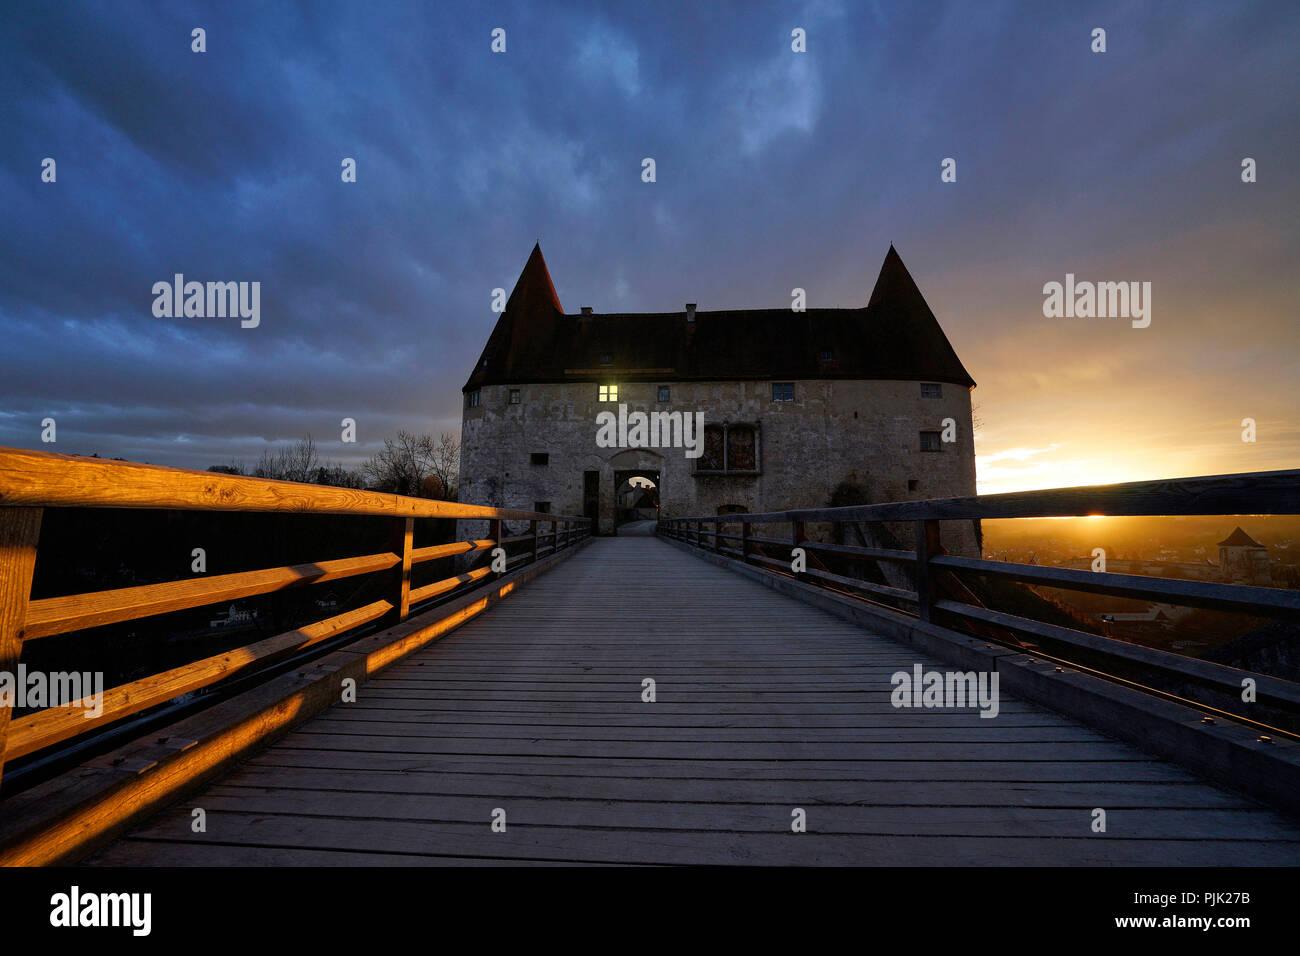 Germany, Bavaria, Upper Bavaria, Burghausen, castle, Georgstor, evening, sunset, dark, mystical - Stock Image